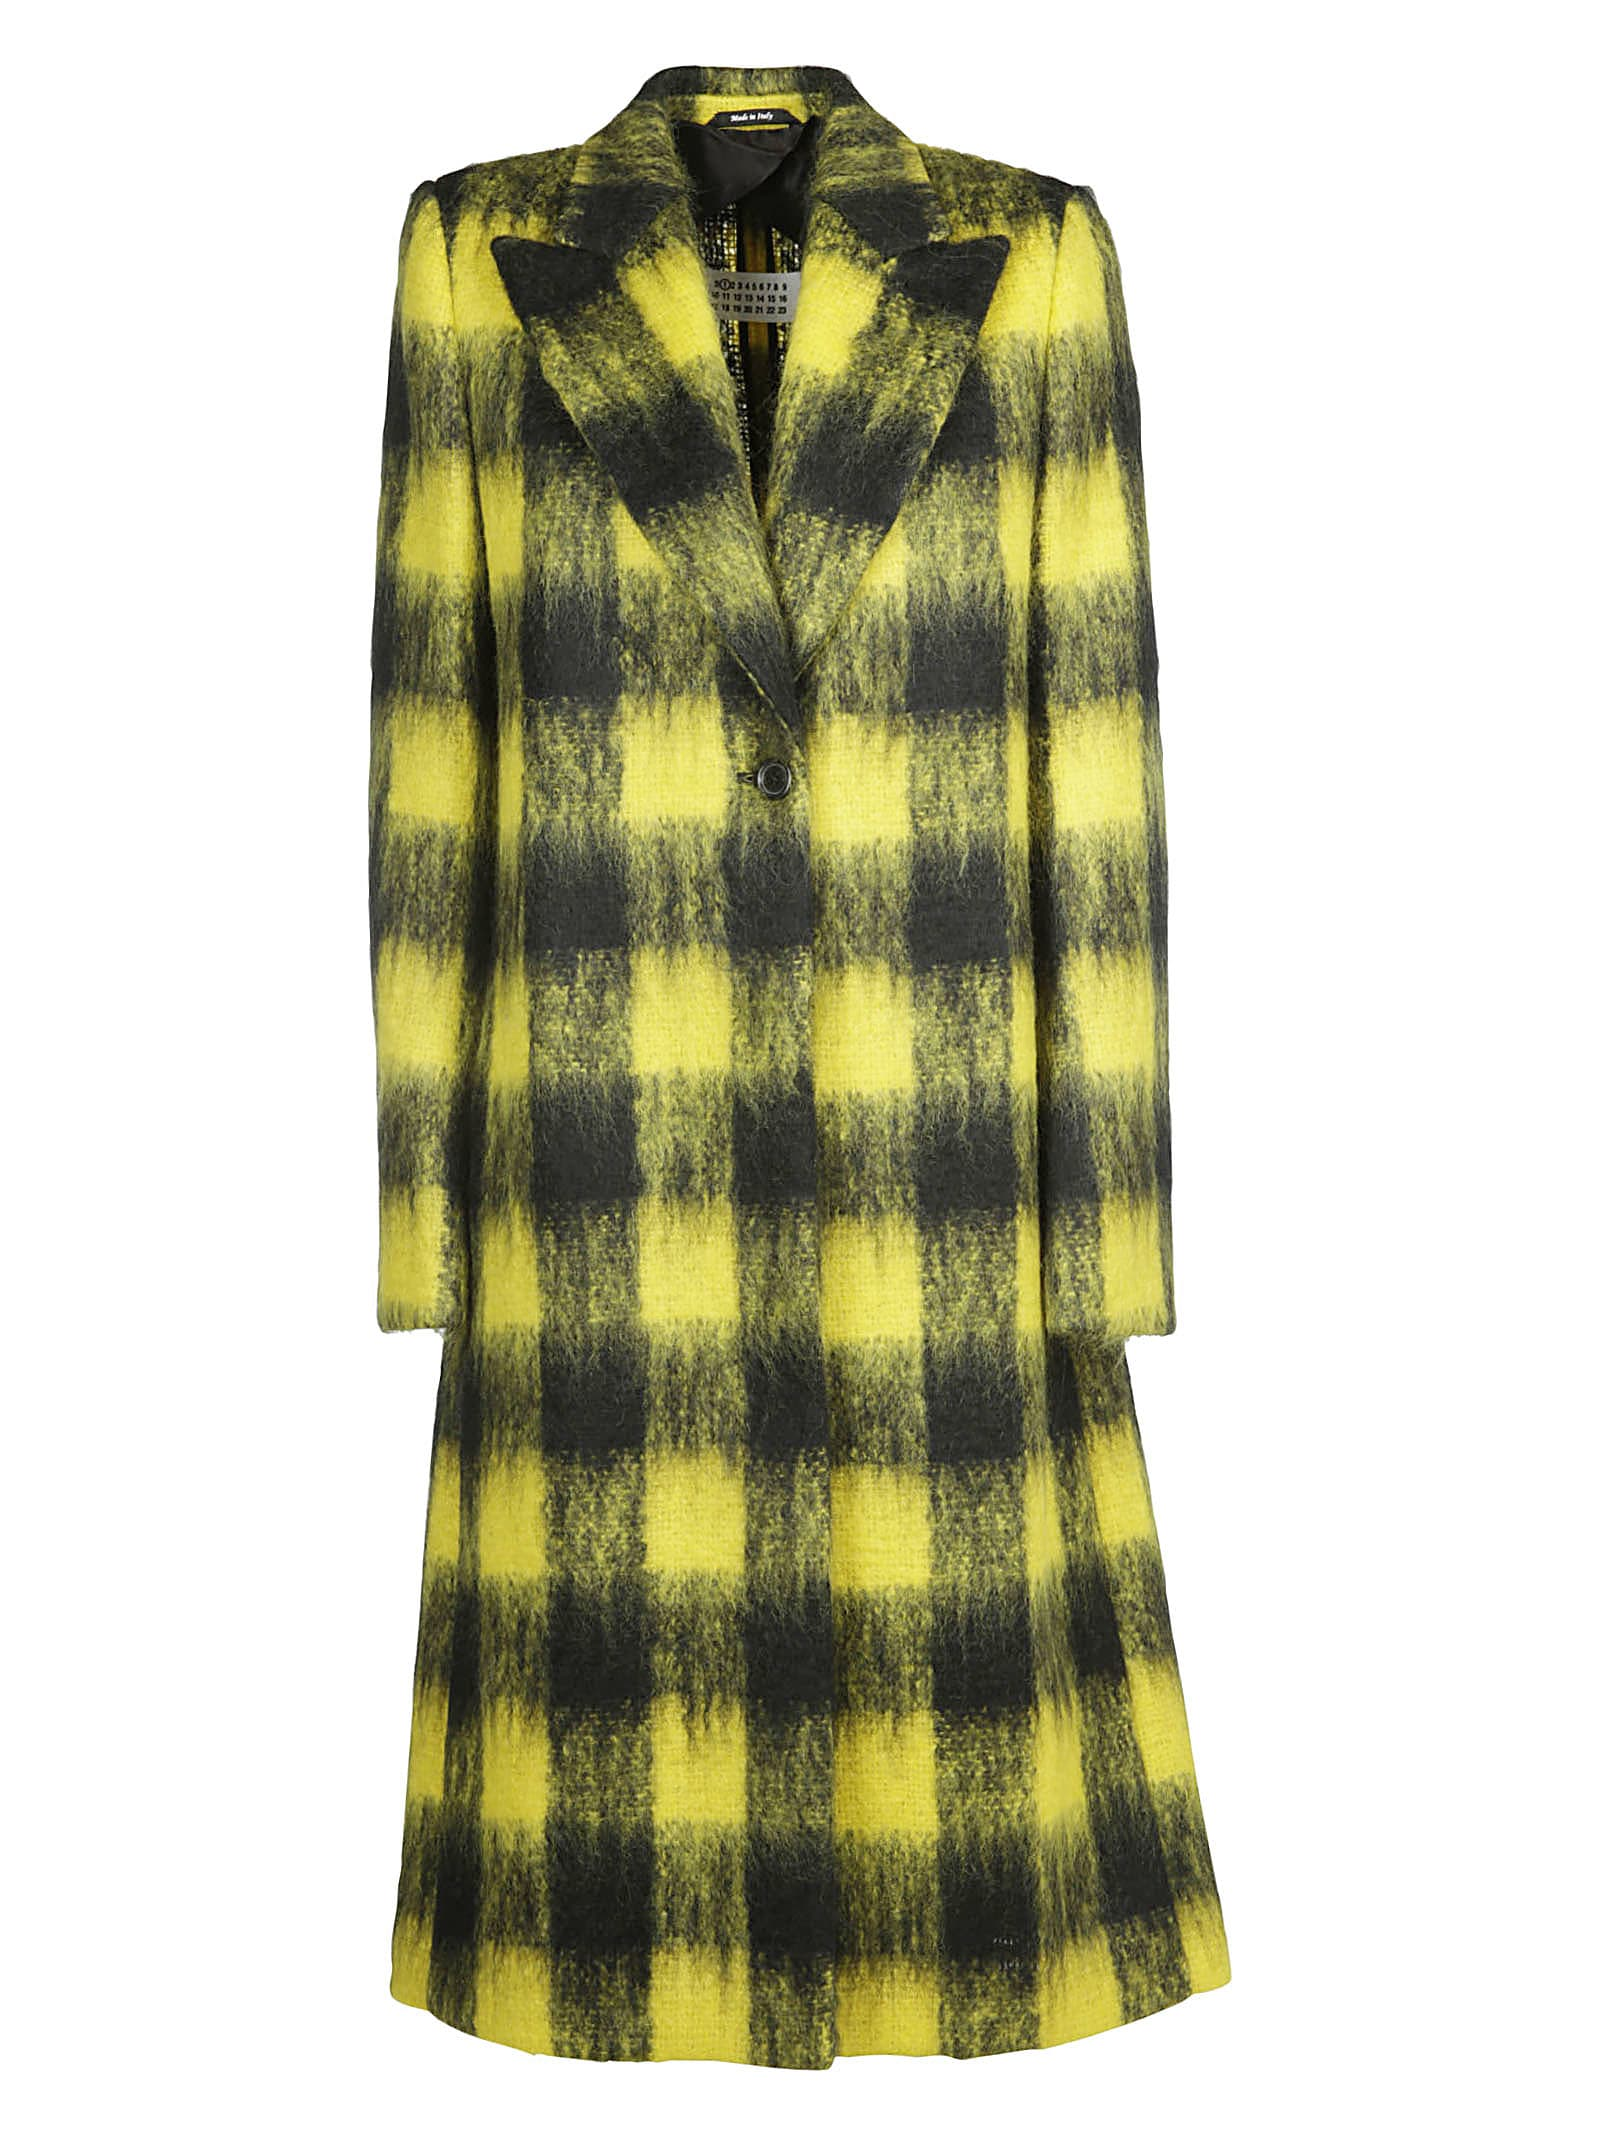 Maison Margiela Cashmere Coat